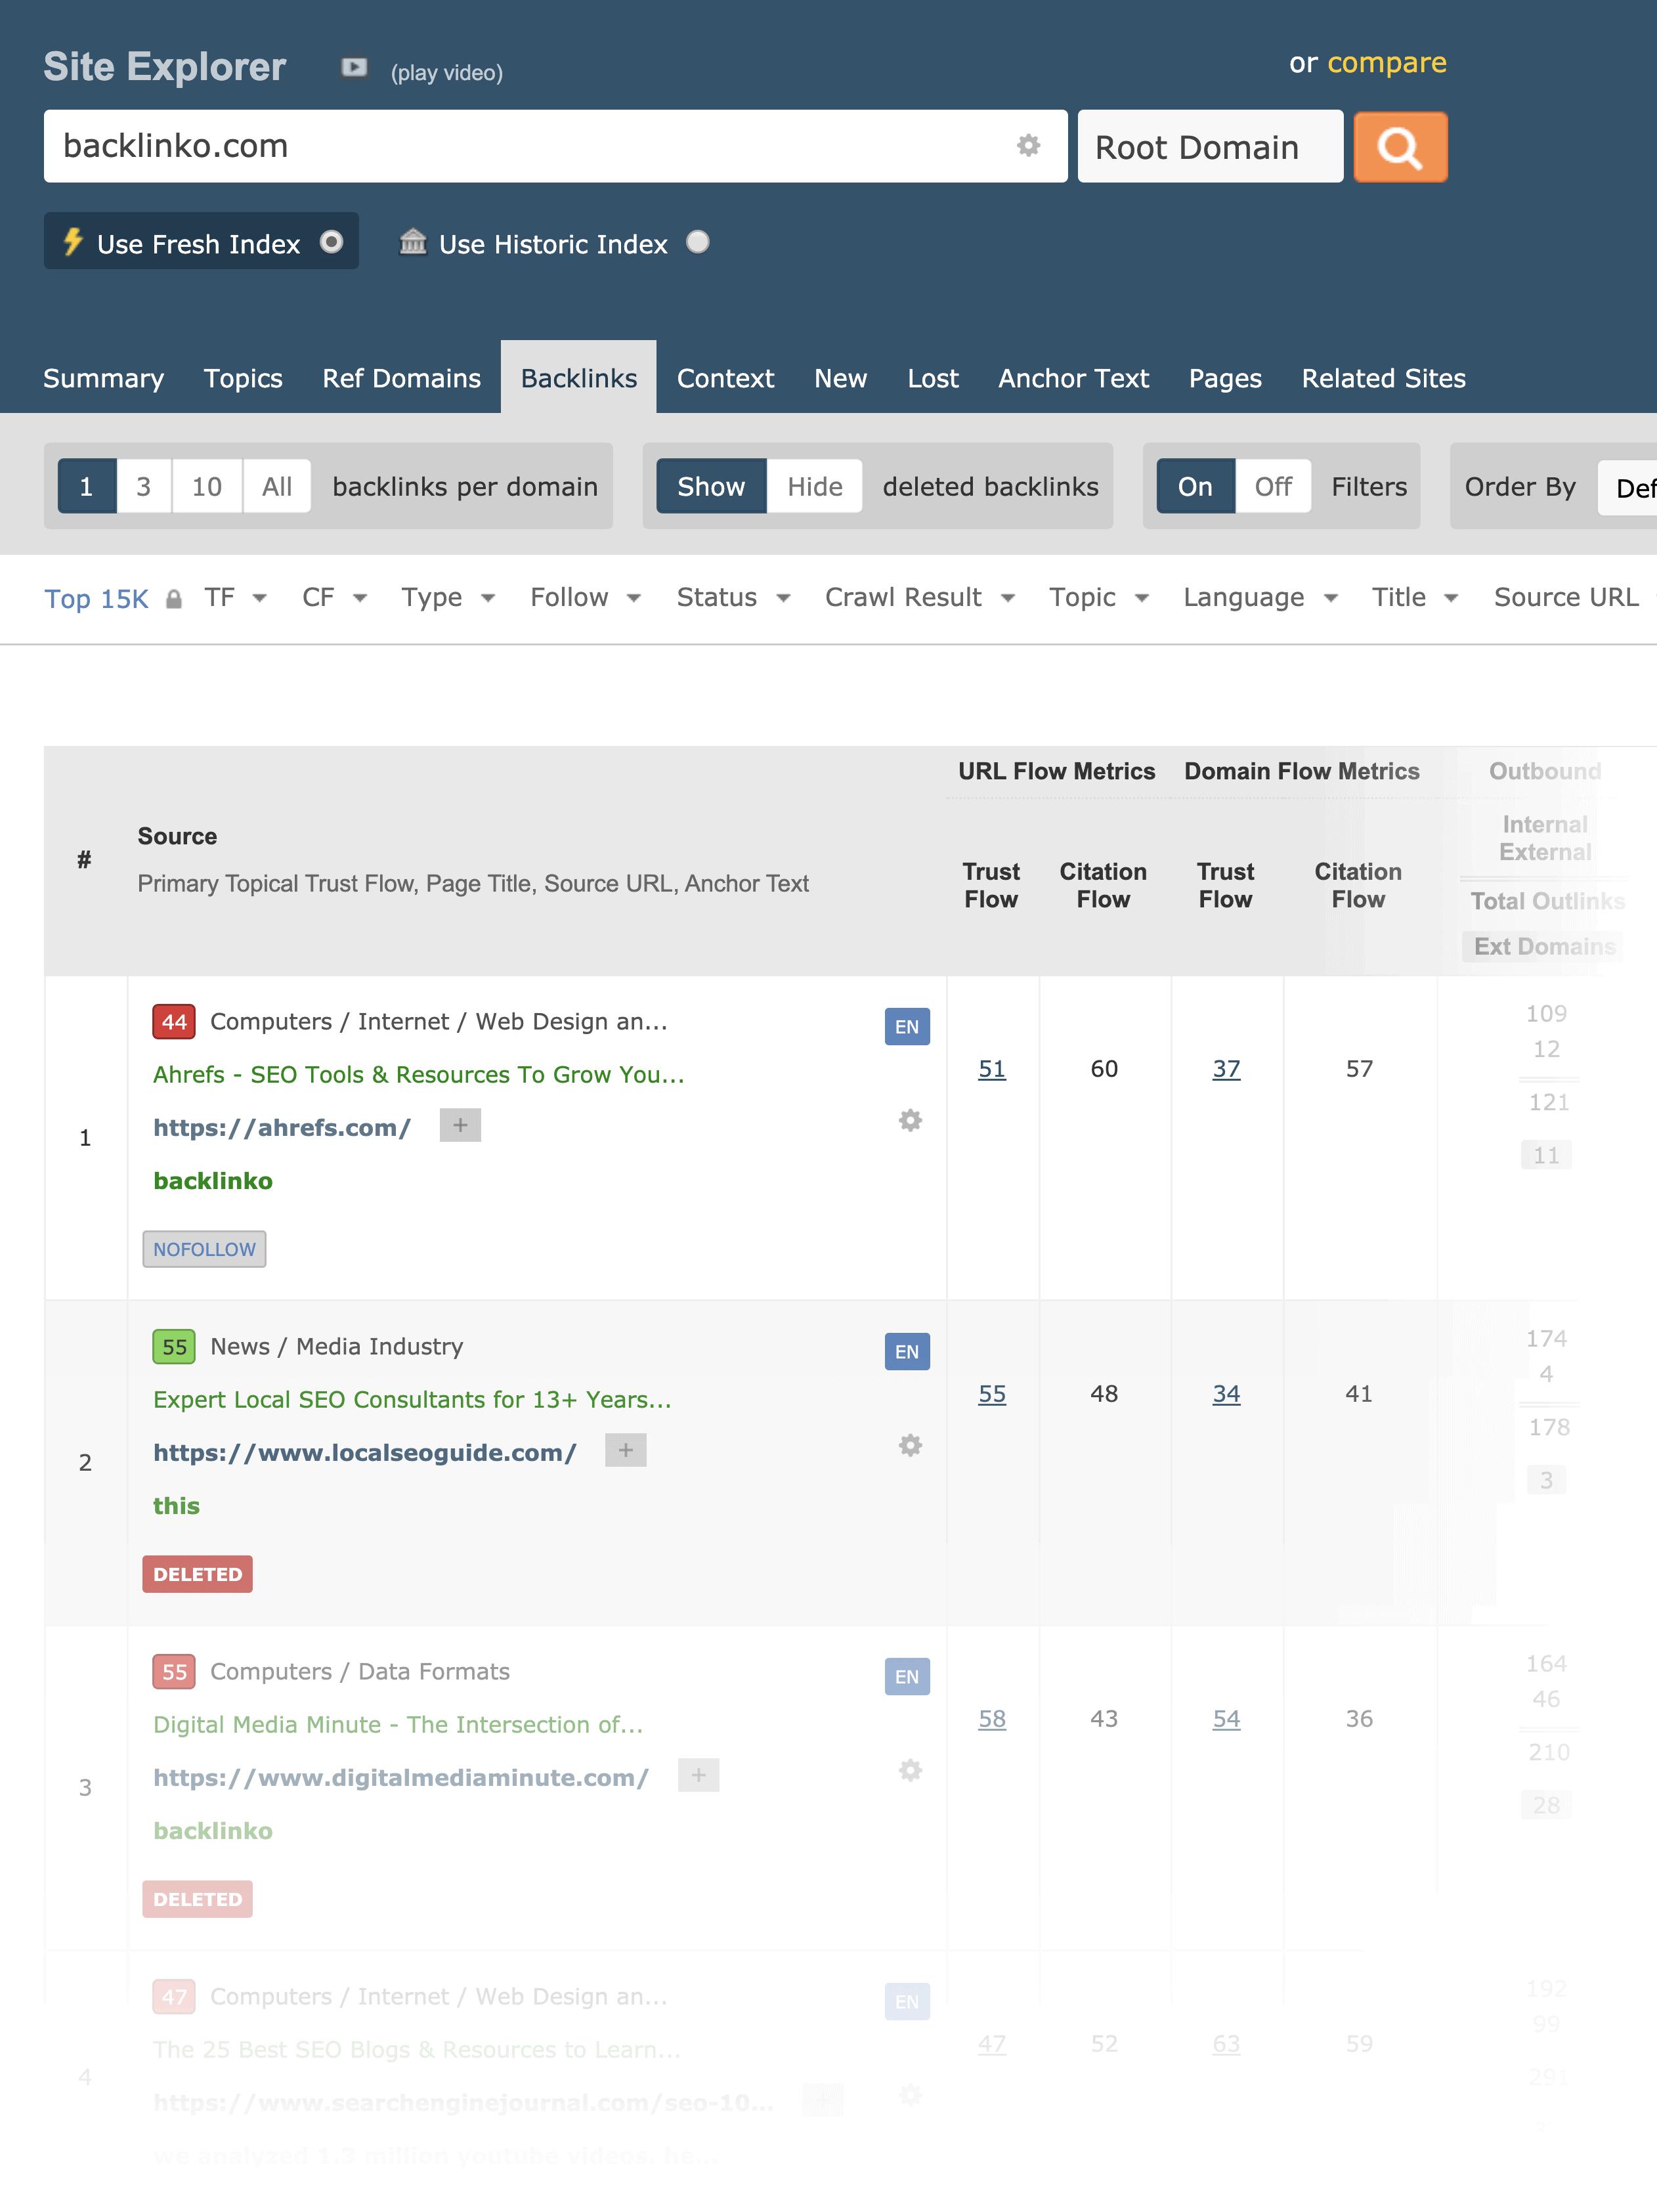 Majestic Backlink Search Interface